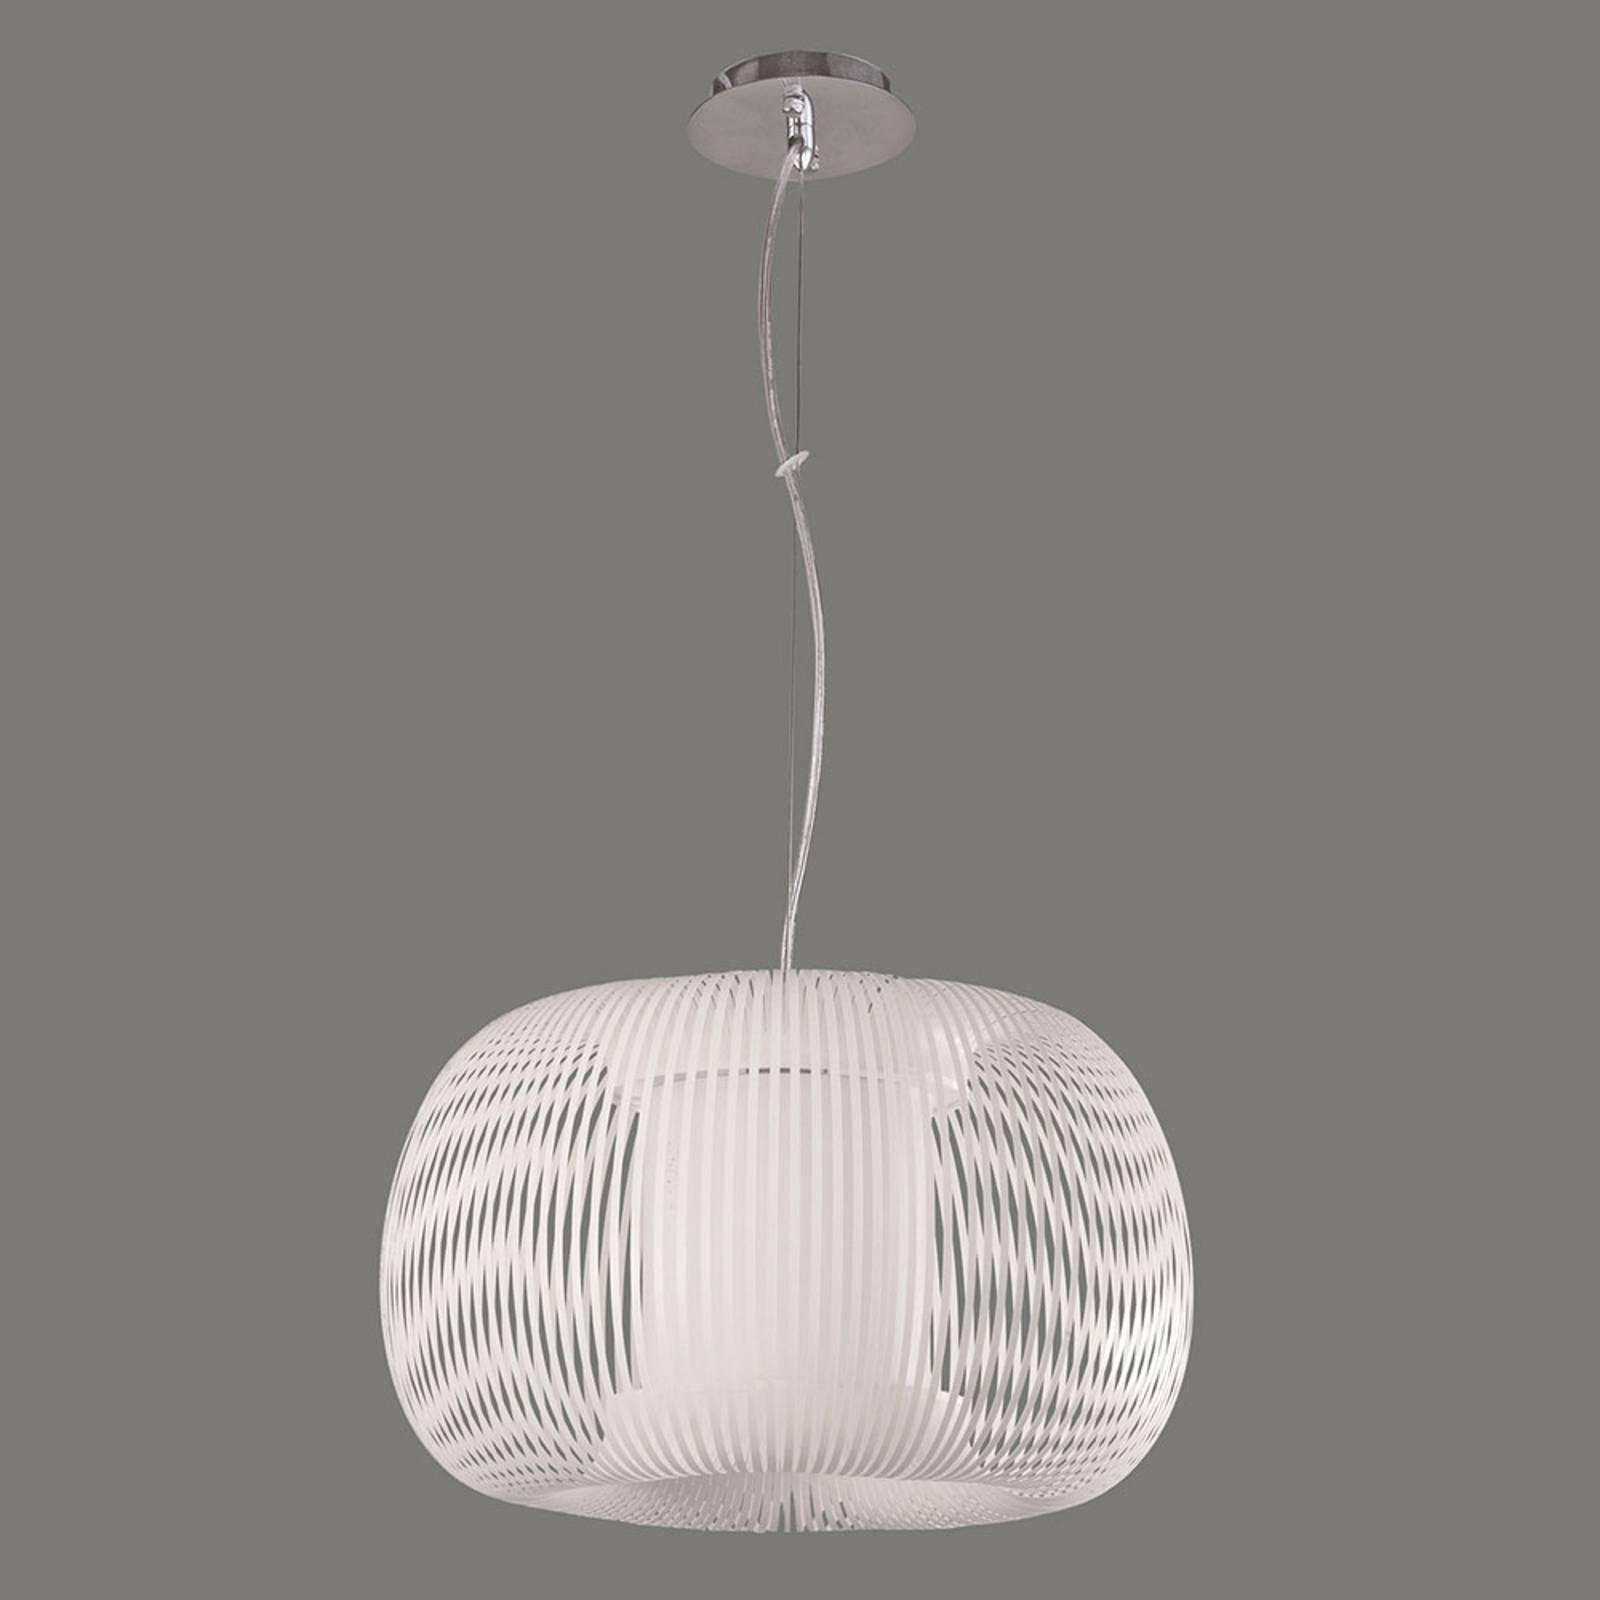 Hanglamp Mirta, wit, Ø 45 cm